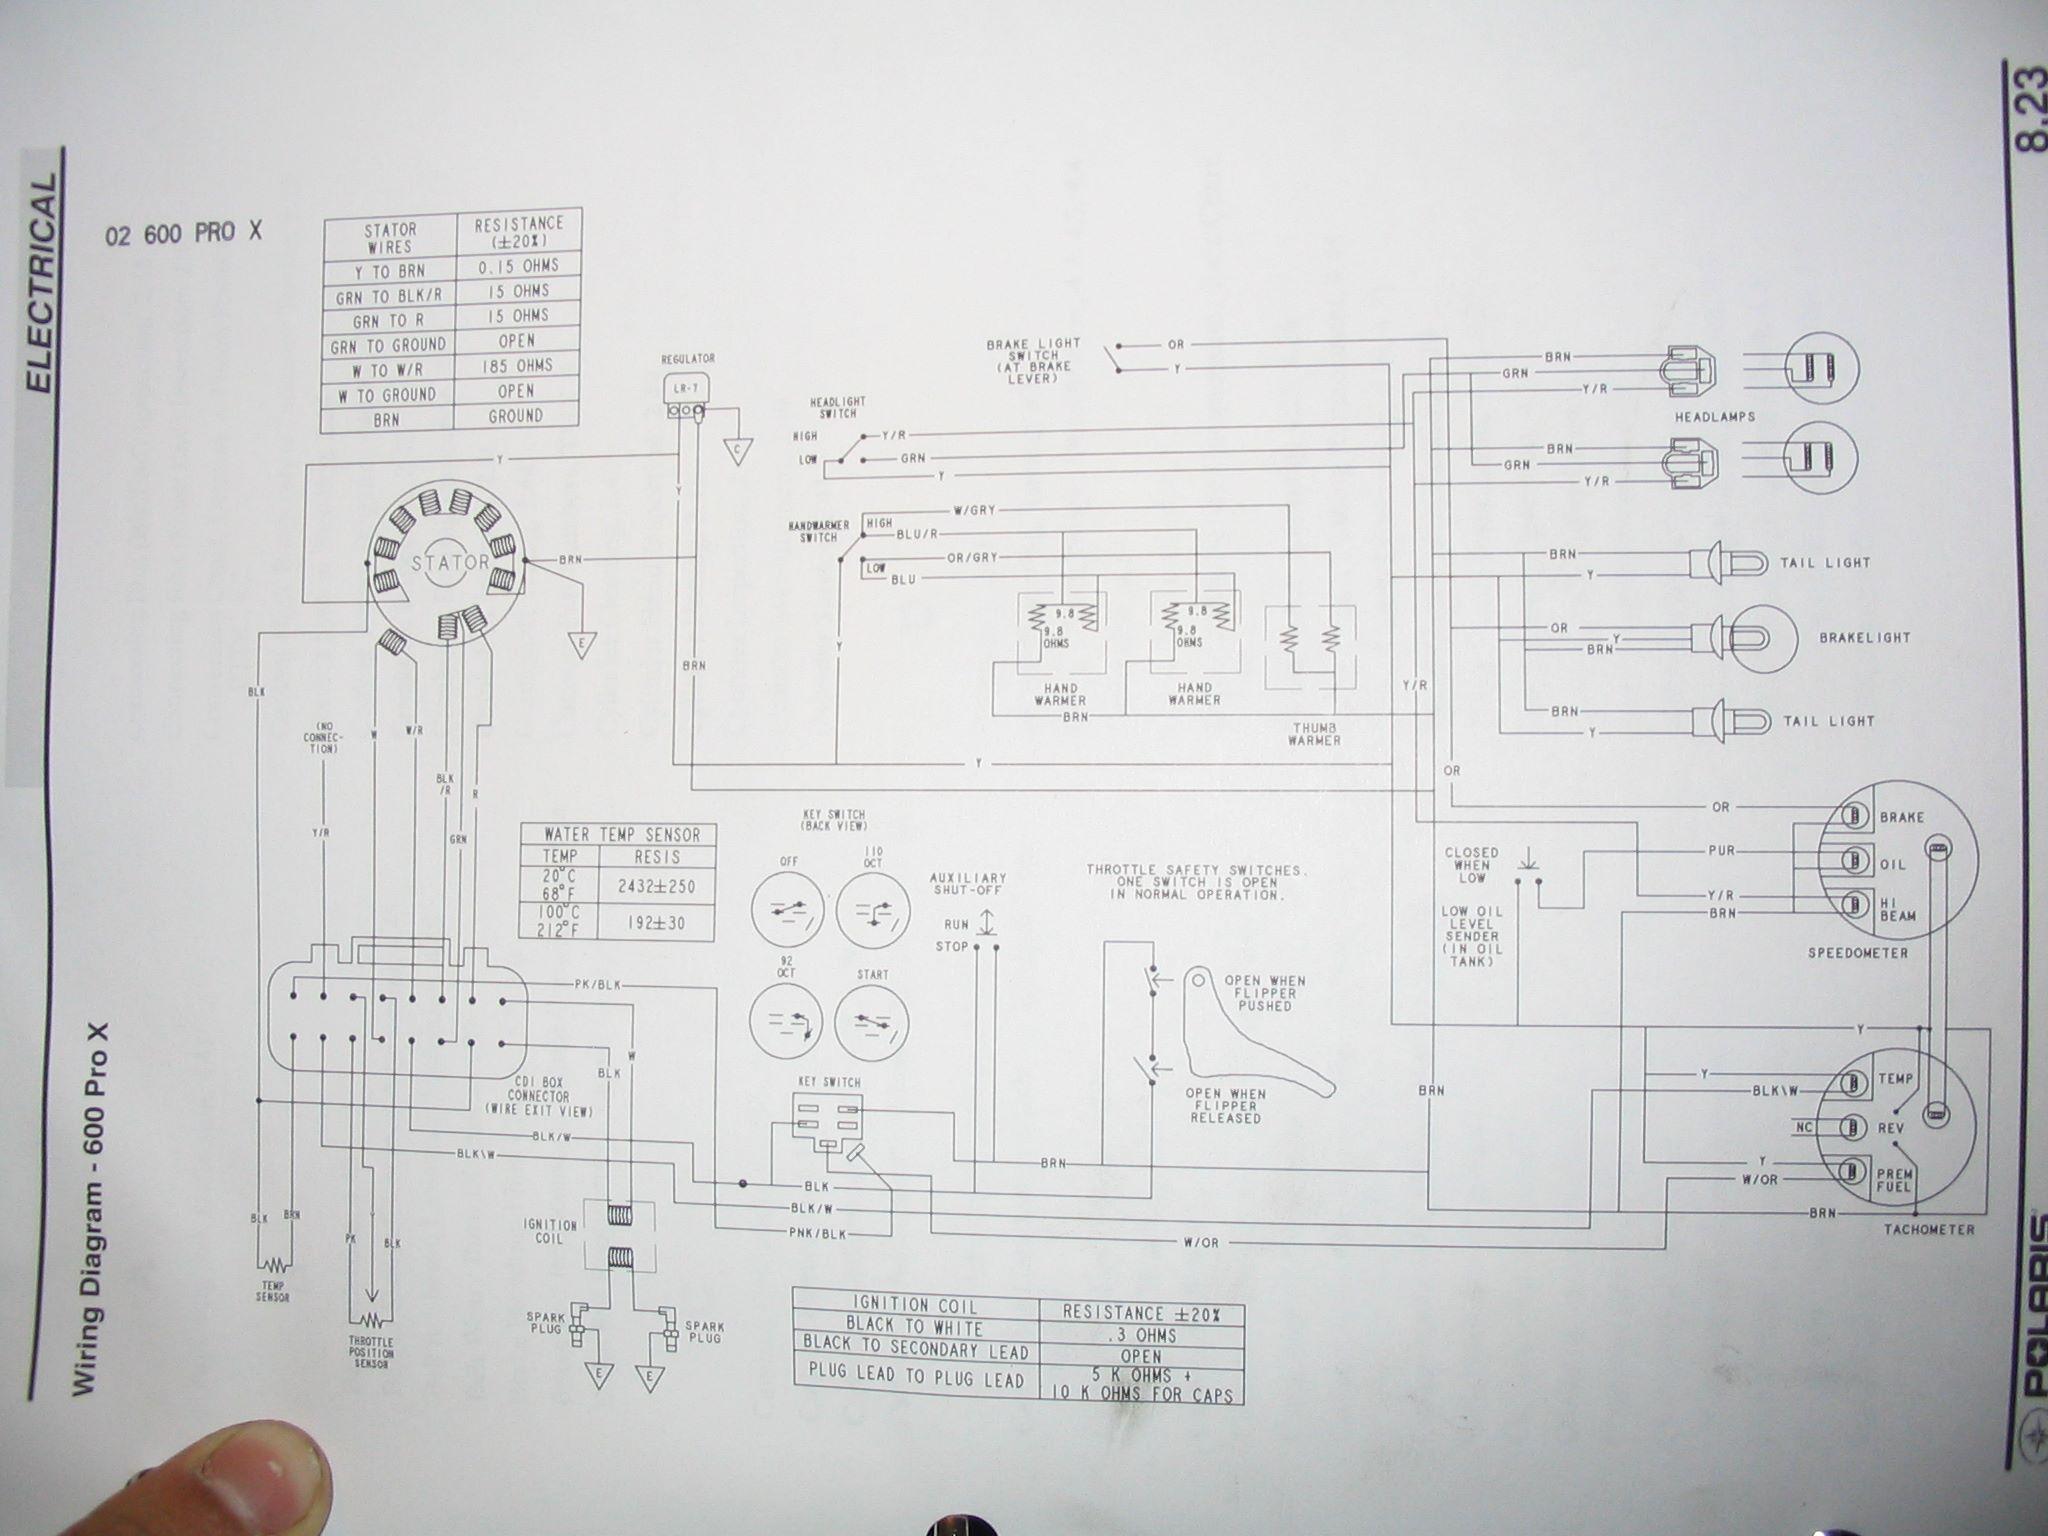 600proXwiring?resize\\\\\\\\\\\\\\\=665%2C499 telequip wiring diagram telequip corporation \u2022 edmiracle co  at readyjetset.co